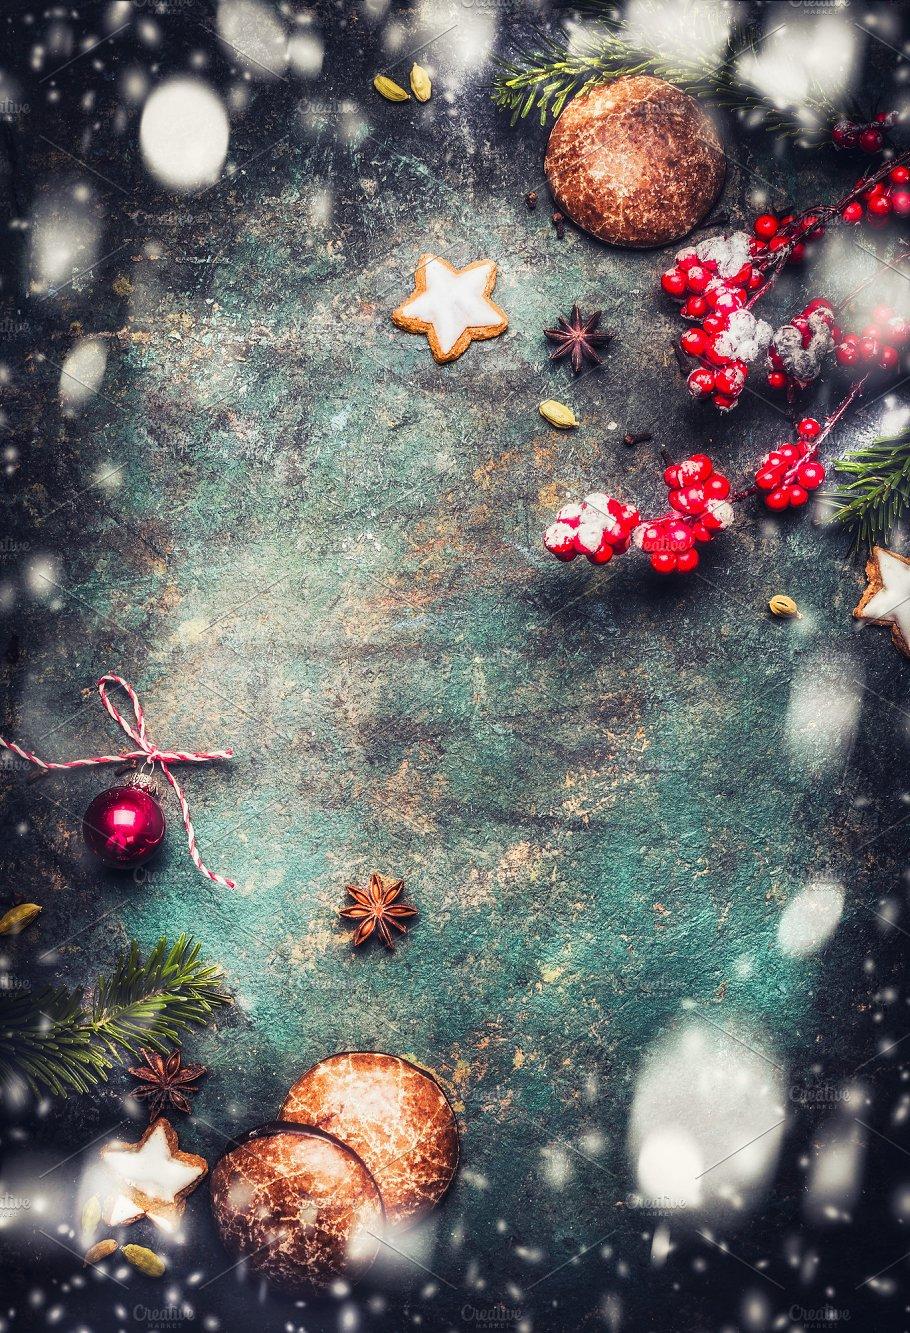 dark rustic christmas background holidays - Rustic Christmas Background